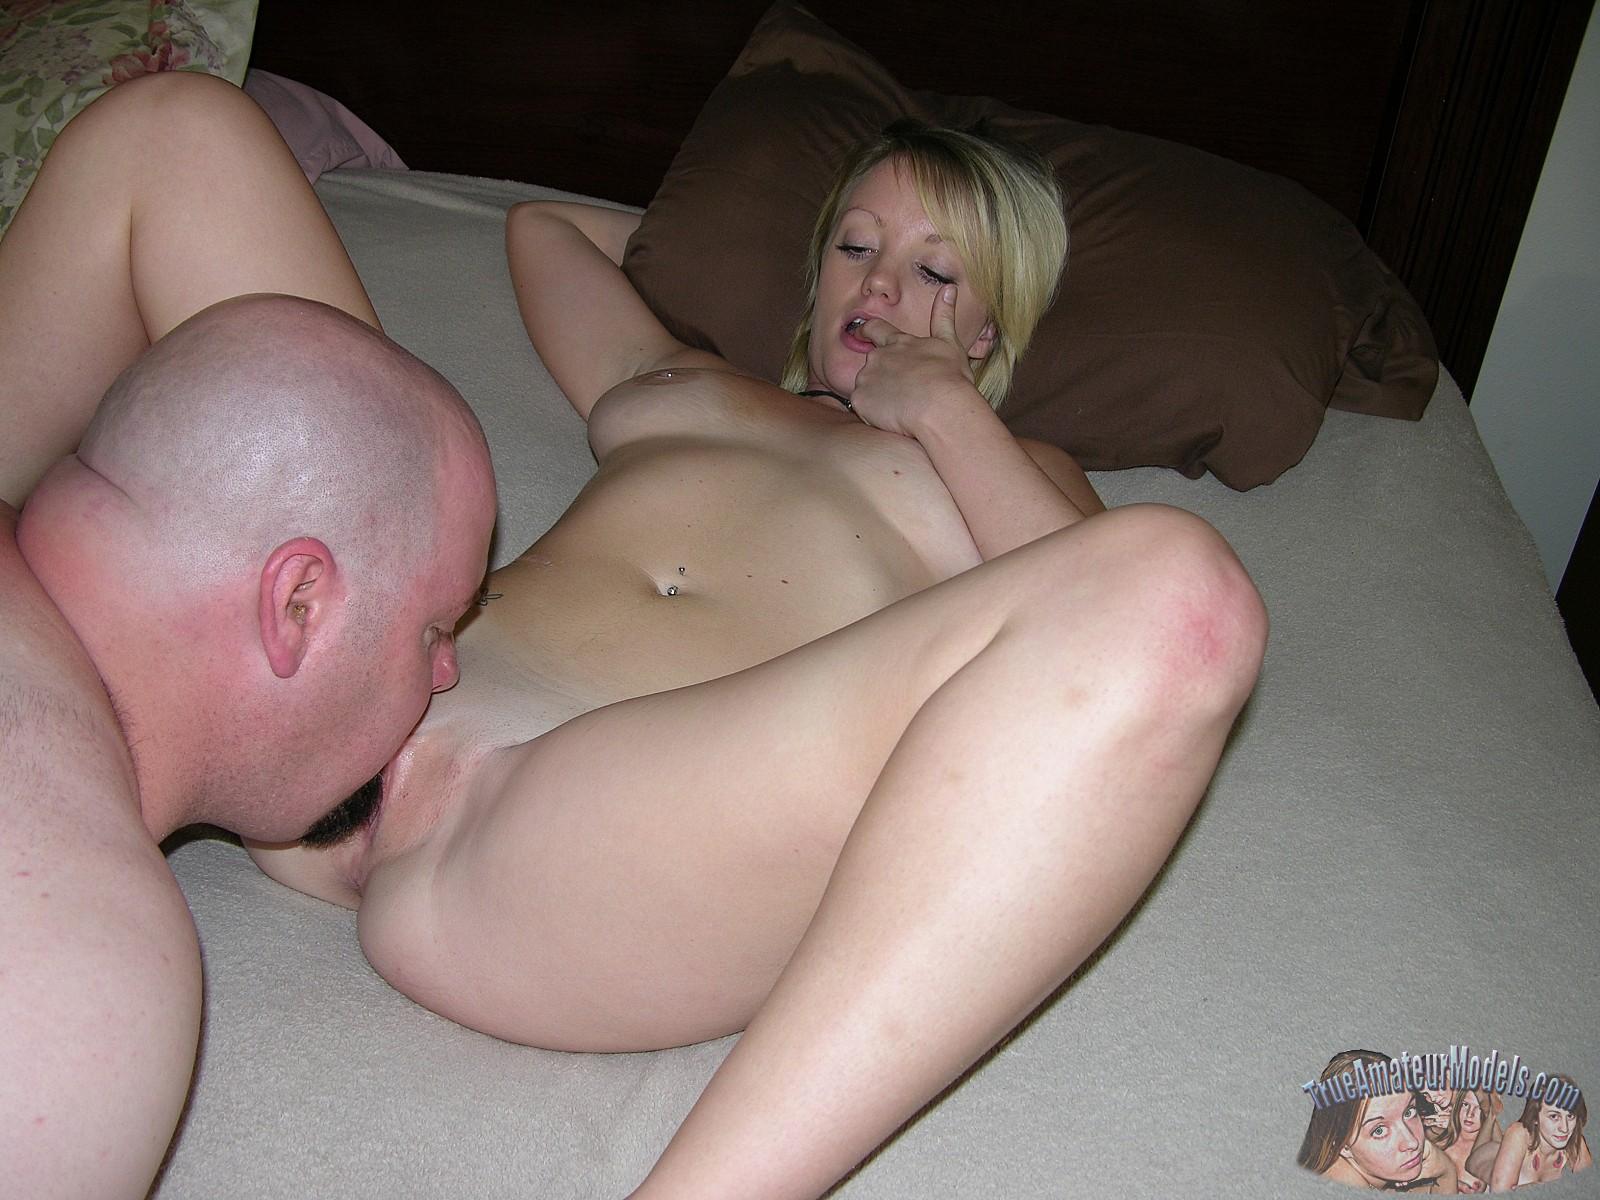 Hot girl gets banged hard